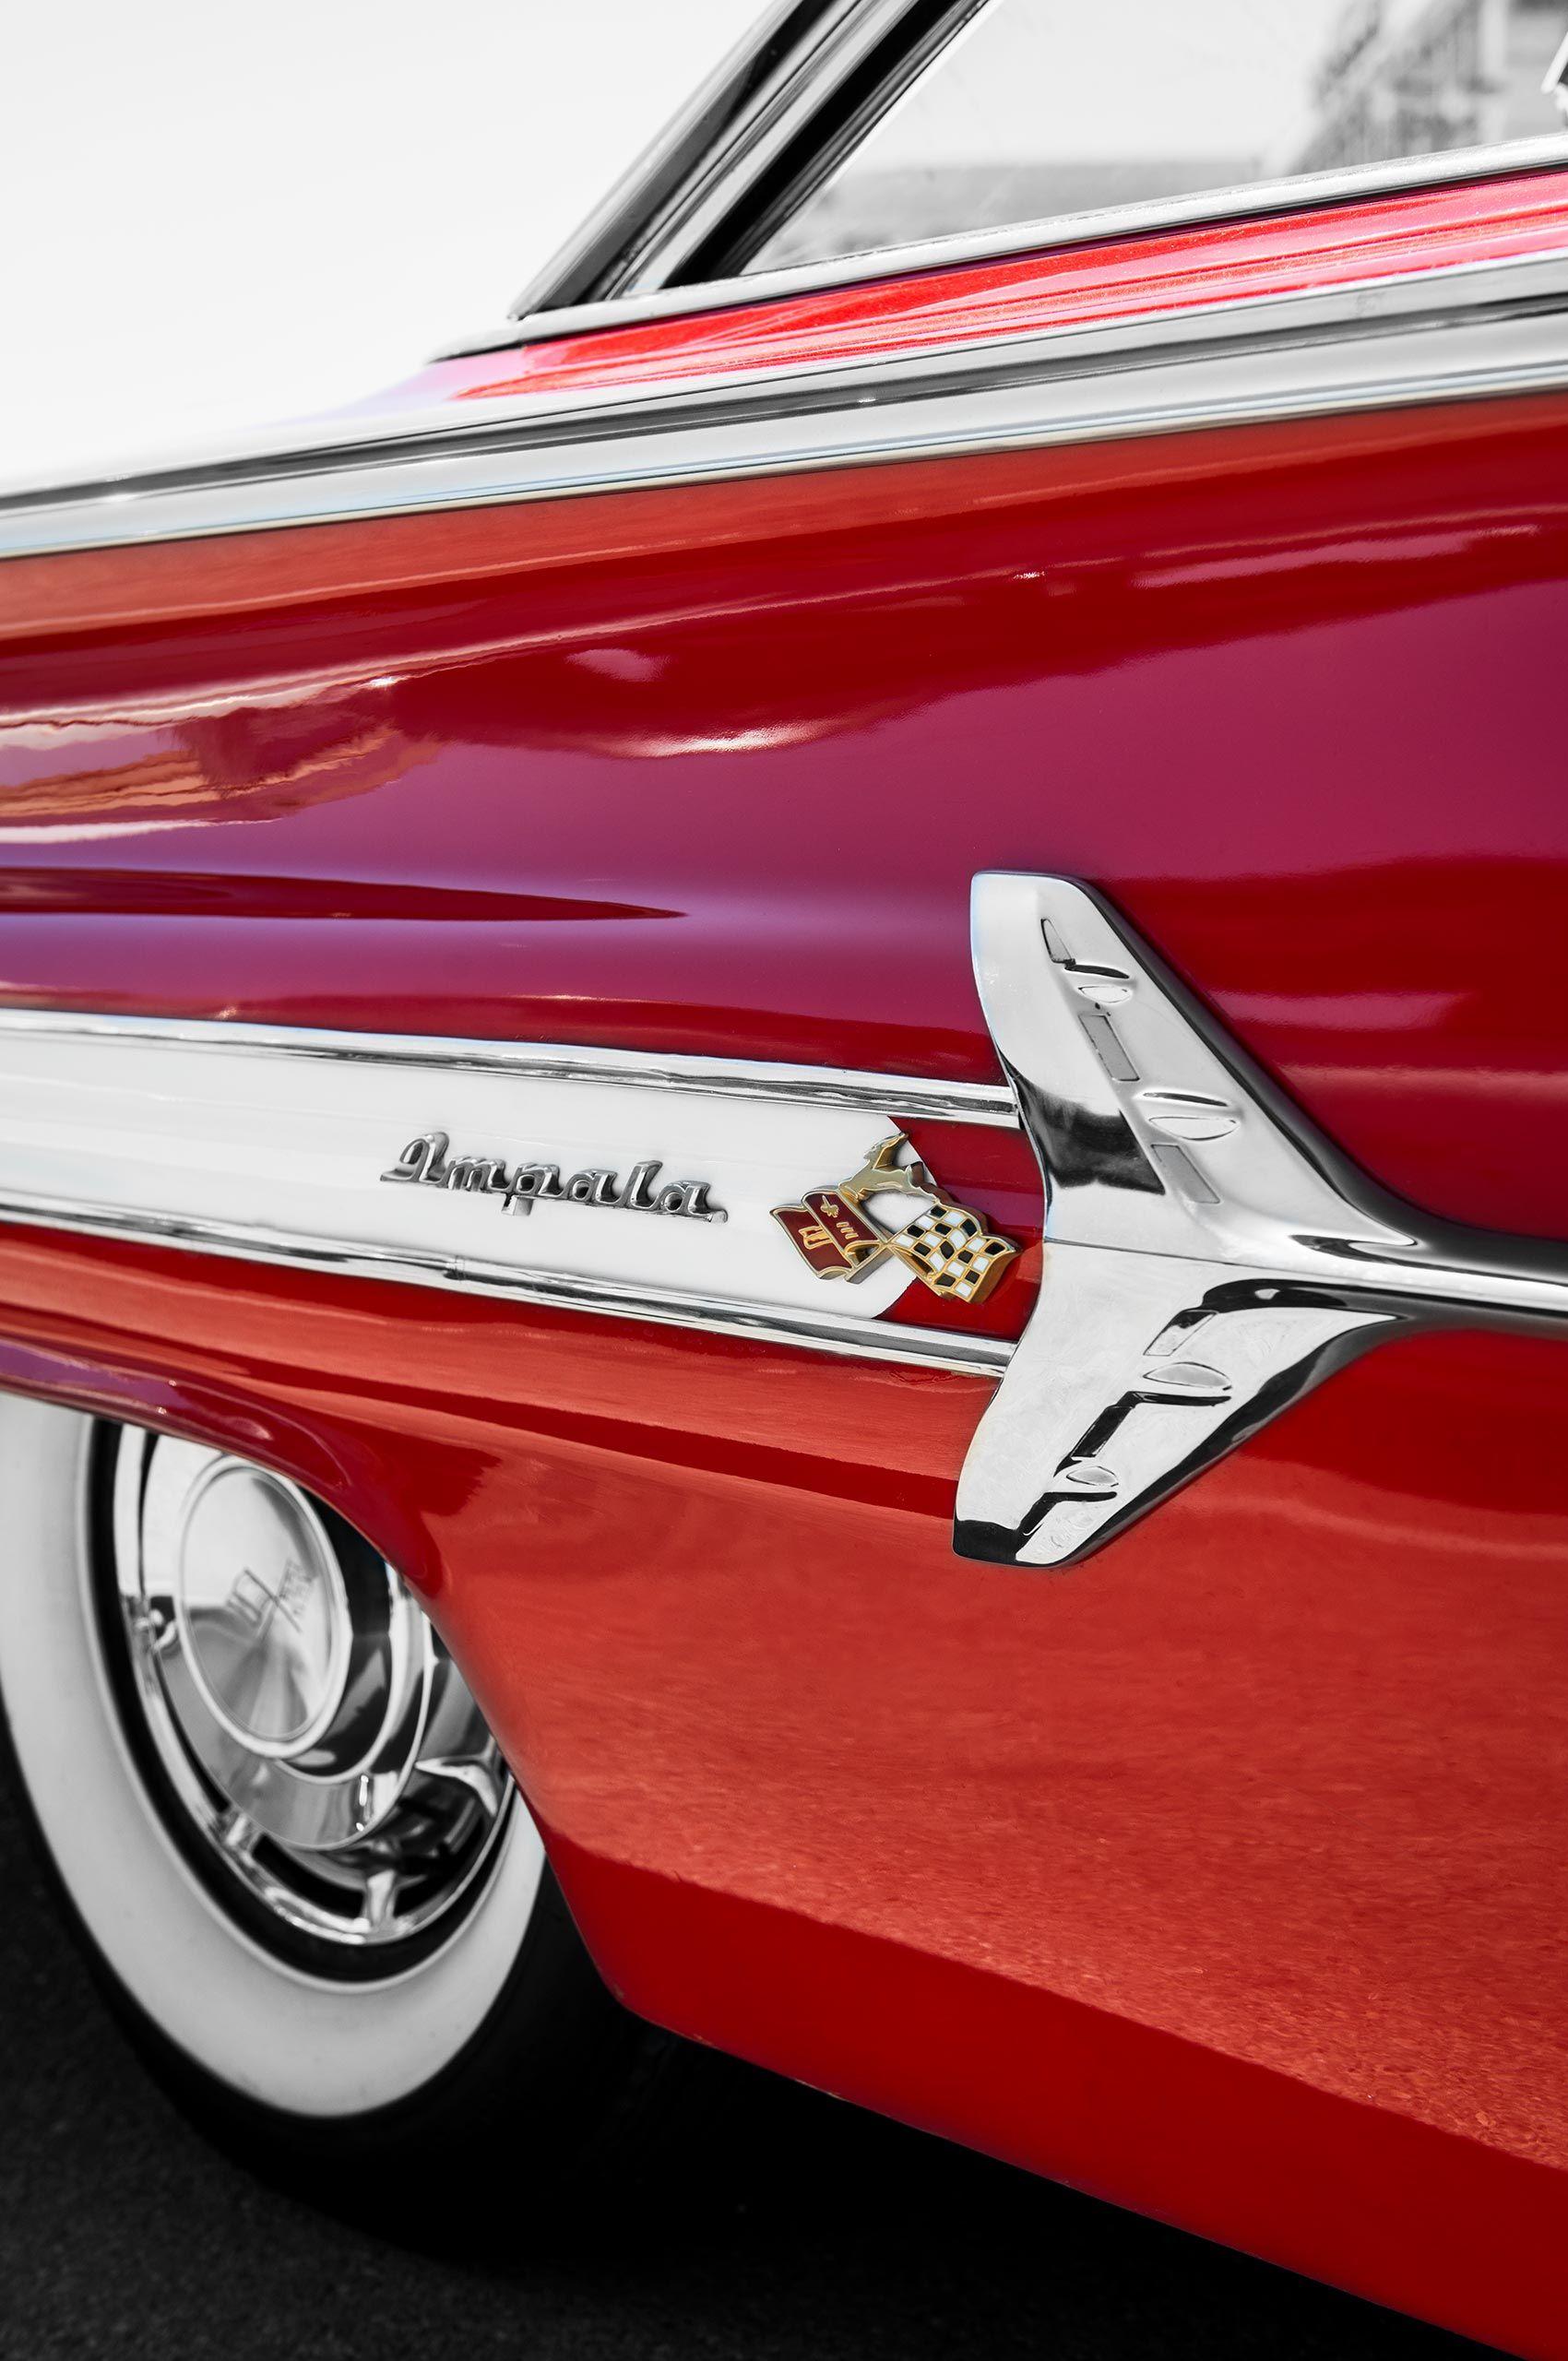 classic-impala-detail-vivalasvegas-HenrikOlundPhotography.jpg